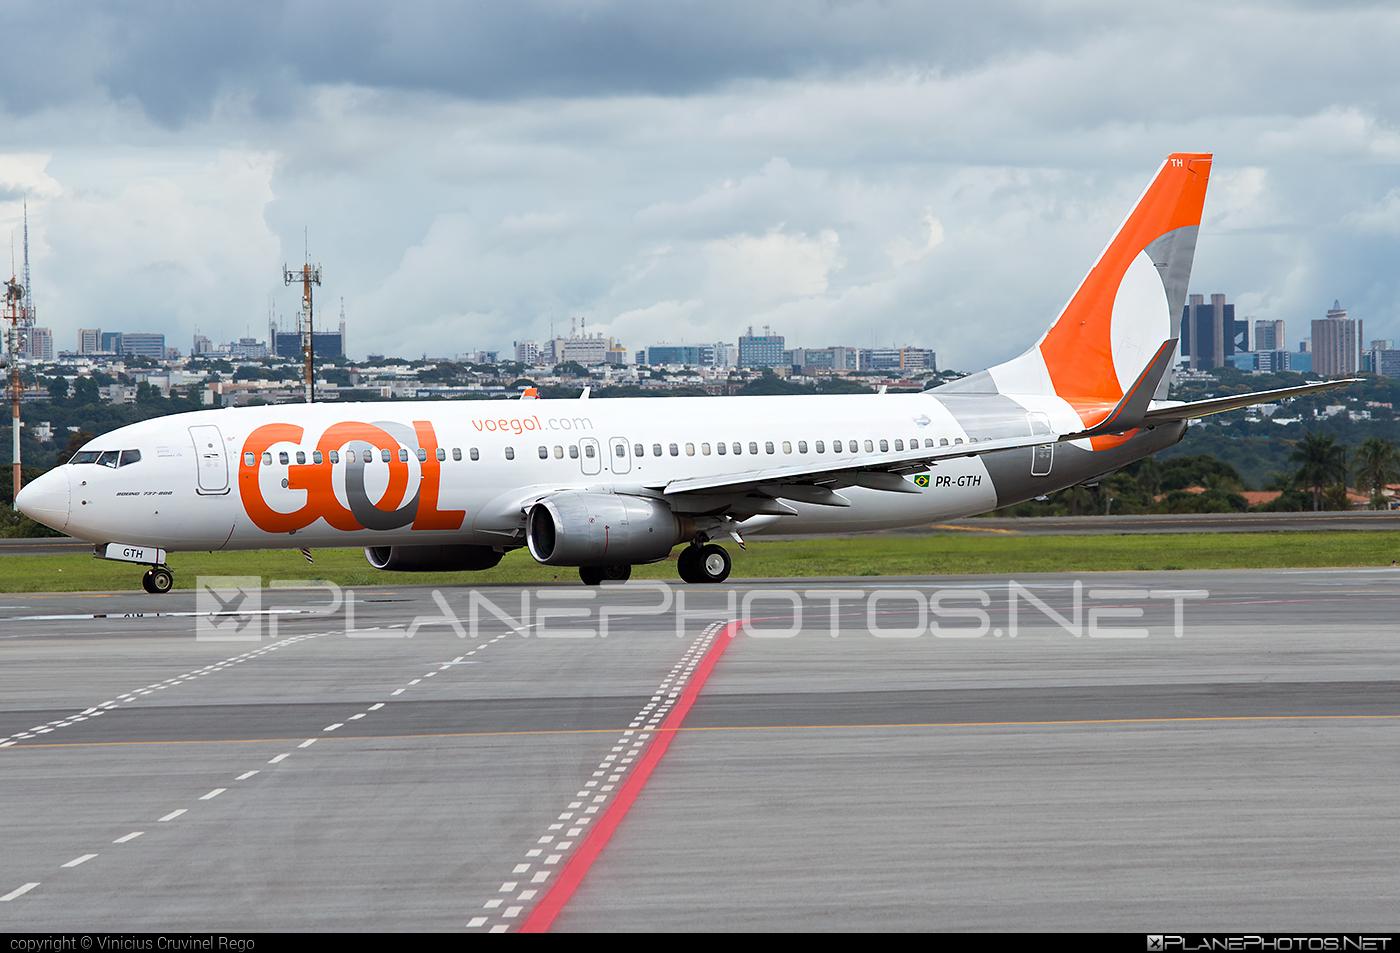 Boeing 737-800 - PR-GTH operated by GOL Linhas Aéreas Inteligentes #b737 #b737nextgen #b737ng #boeing #boeing737